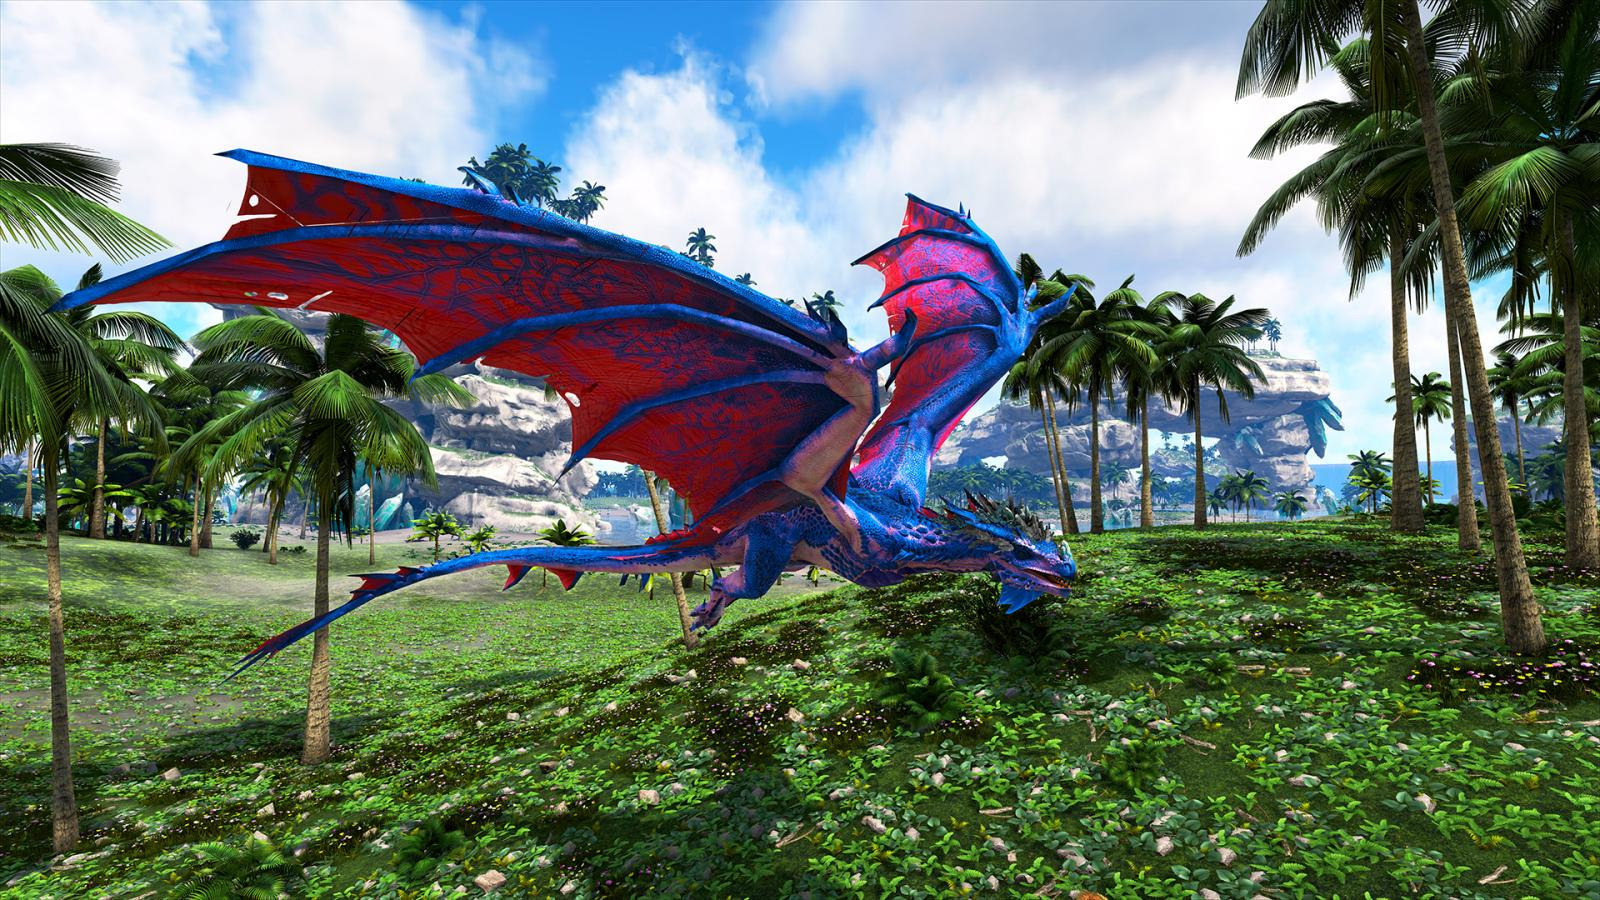 large.58d5b955ea7f9_WolfAngelus-TropicalFlight-8x.jpg